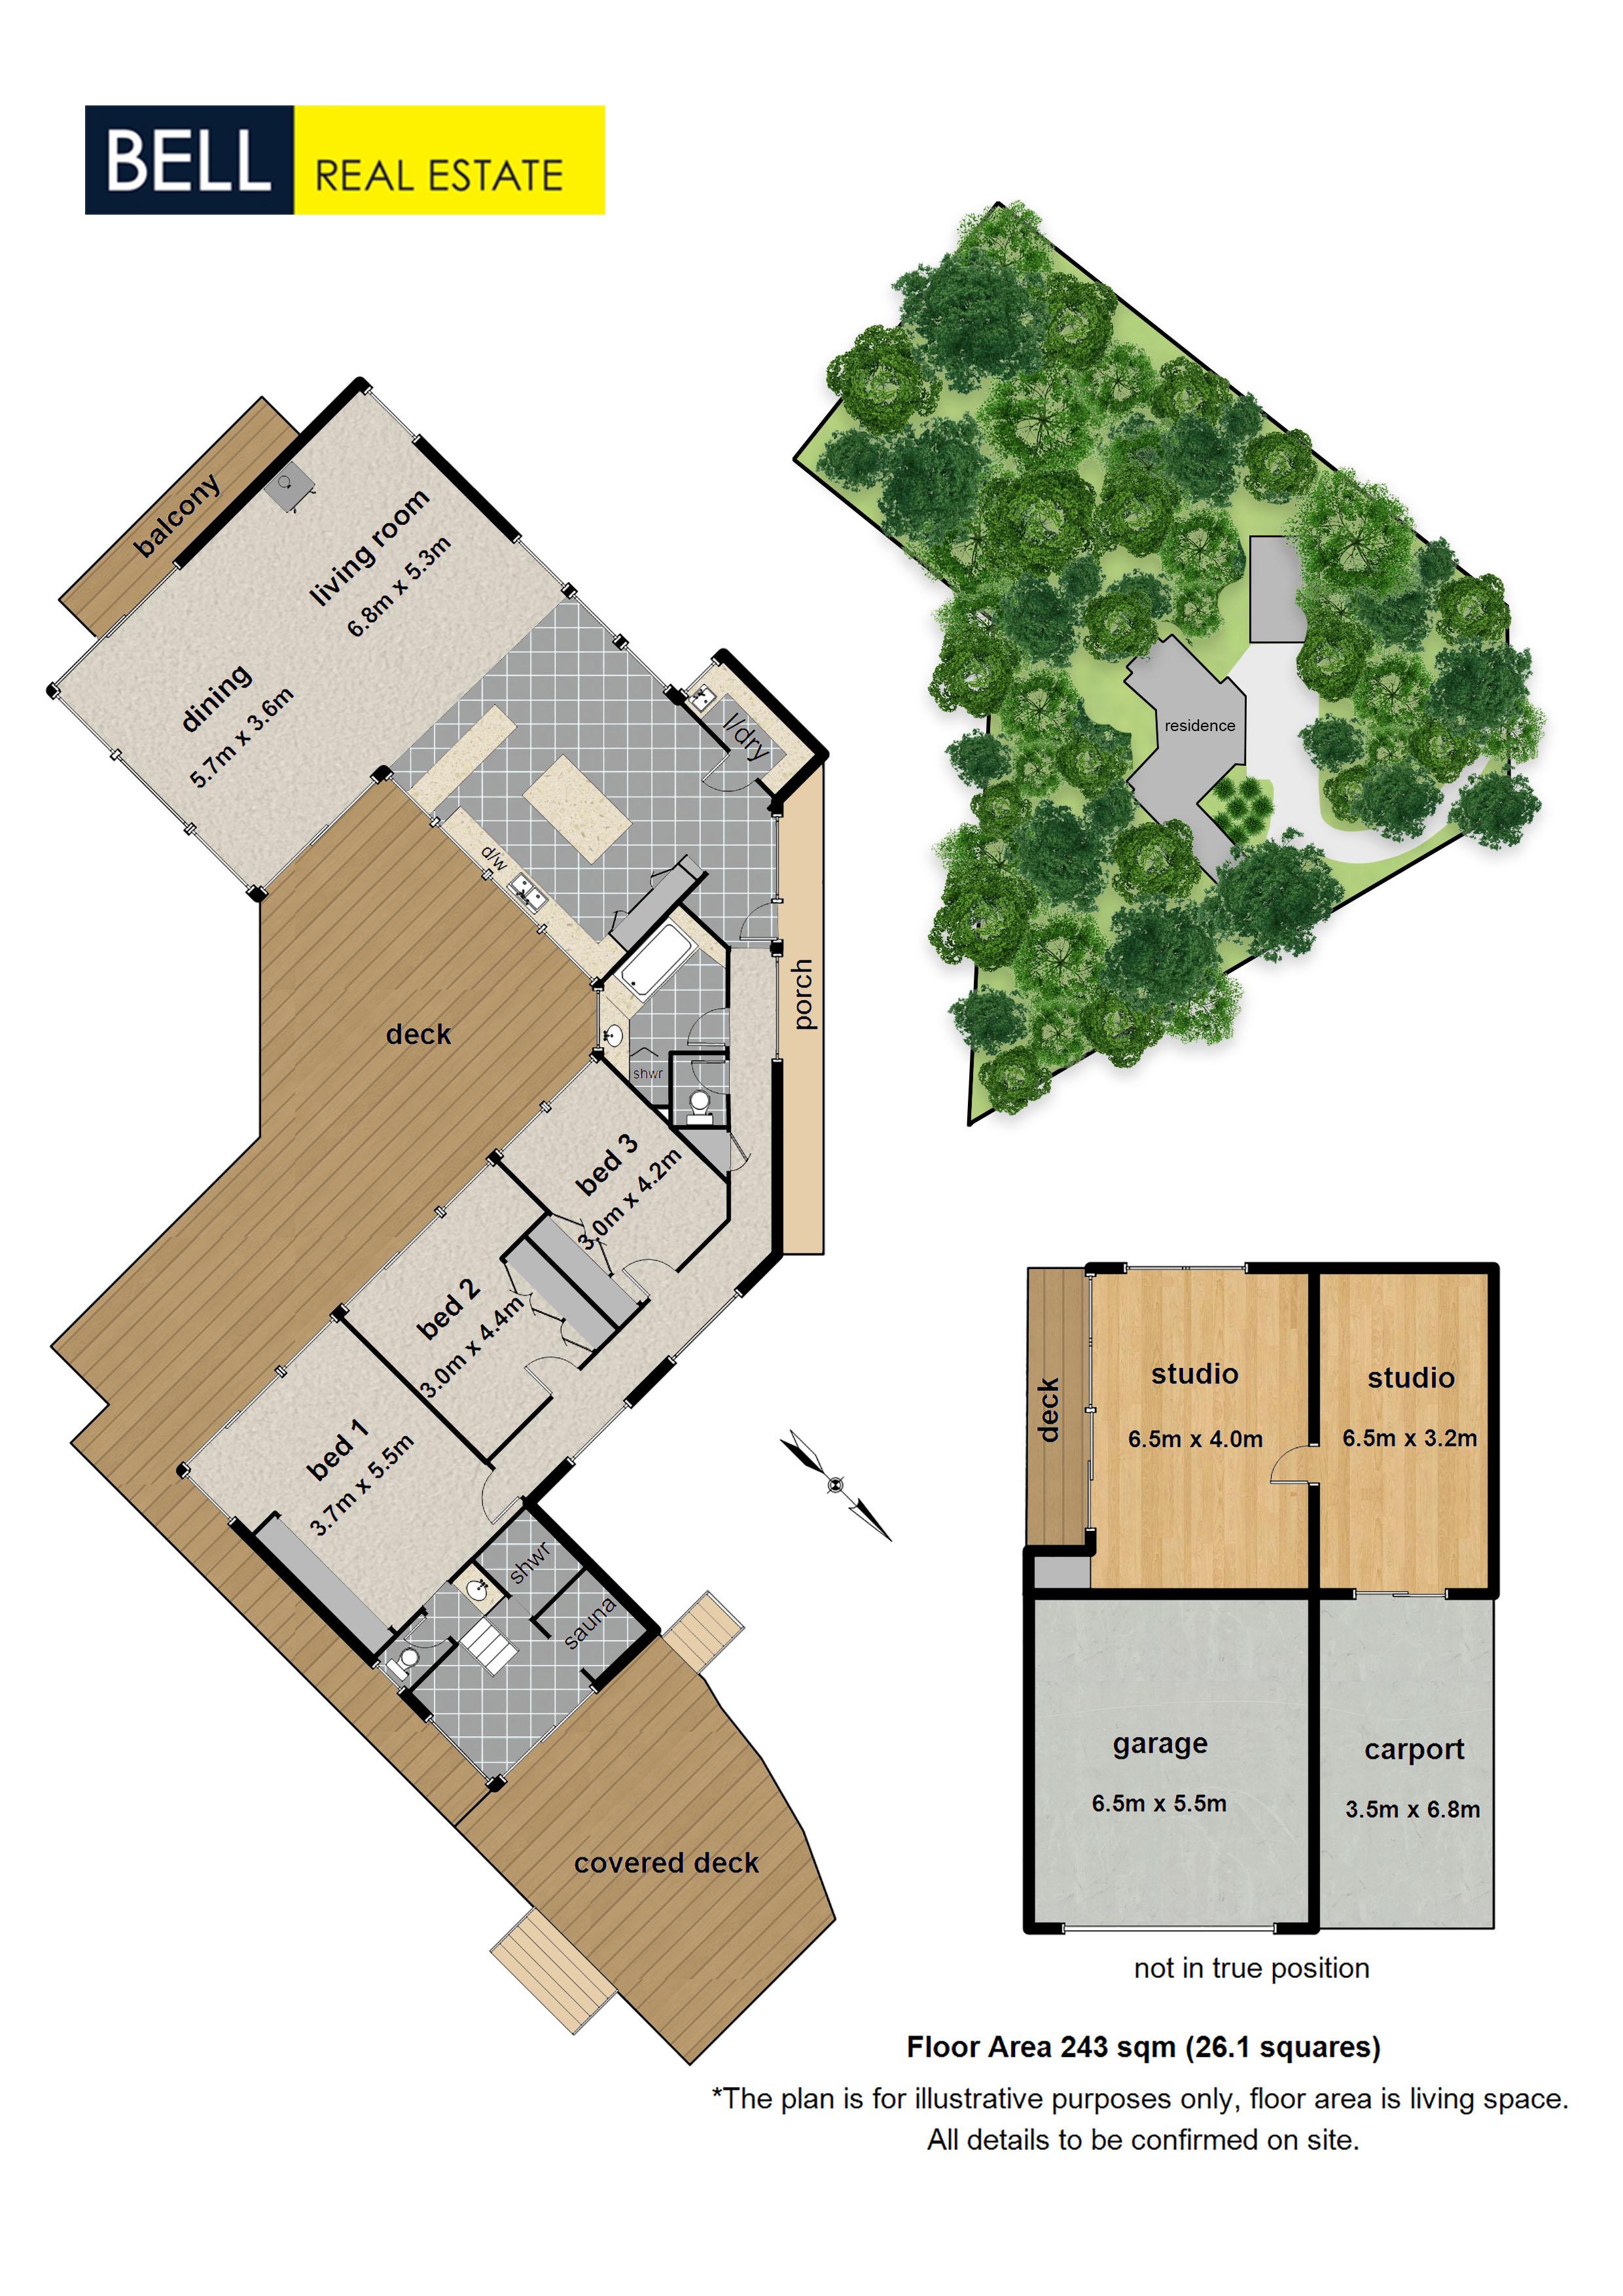 https://assets.boxdice.com.au/bell_re/rental_listings/1532/e8332850.jpg